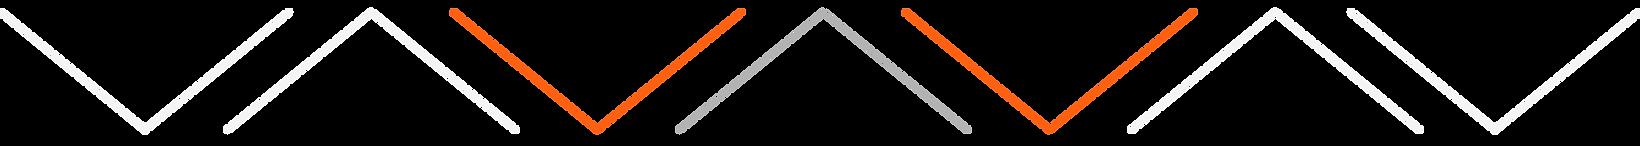 HD_Illustrations_Roof-Pattern_Break_x4.png